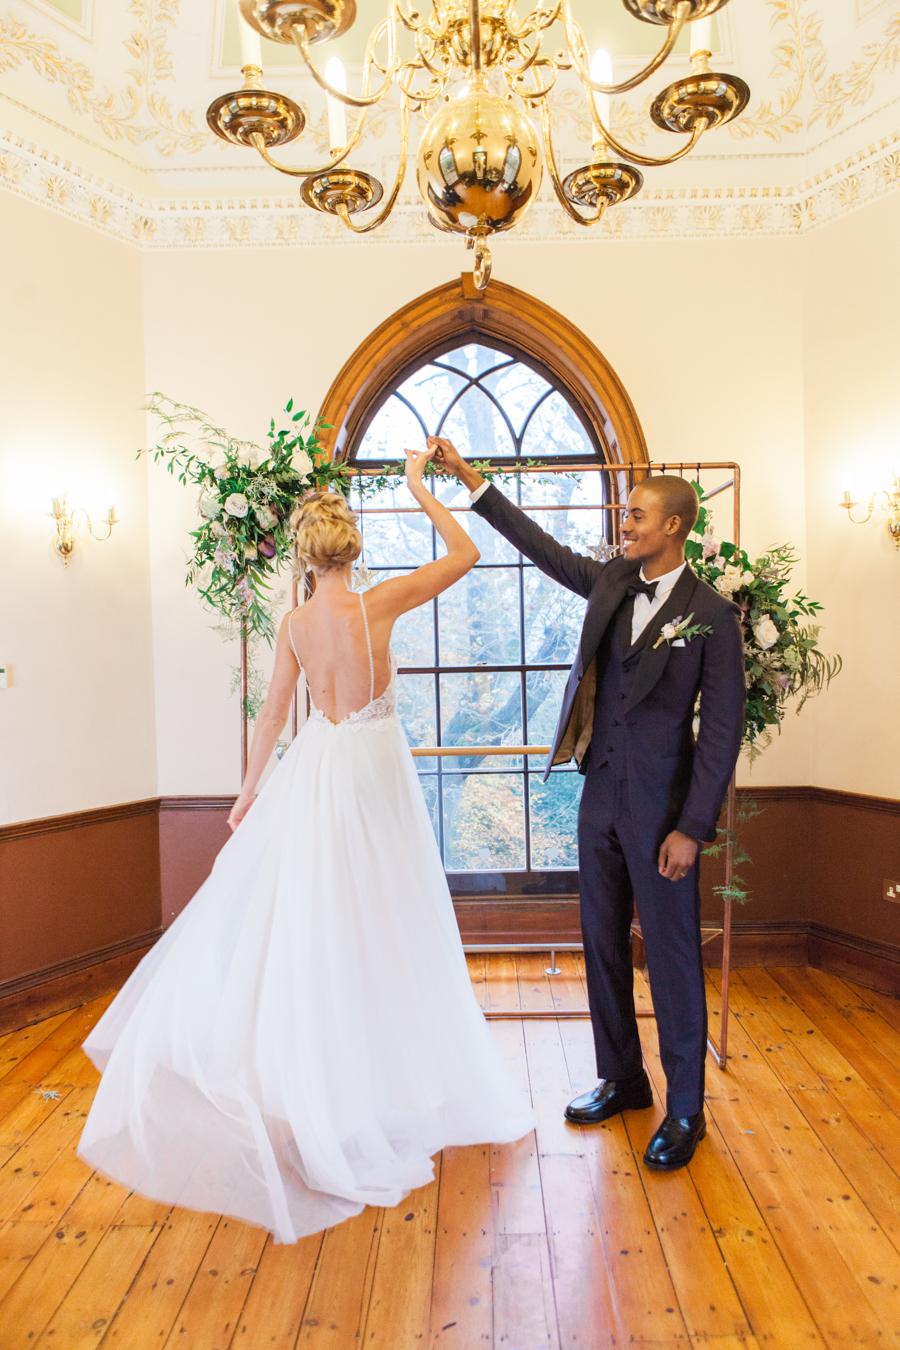 Starry celestial wedding inspiration (with a sprinkling of Disney magic) - Amanda Karen Photography (45)